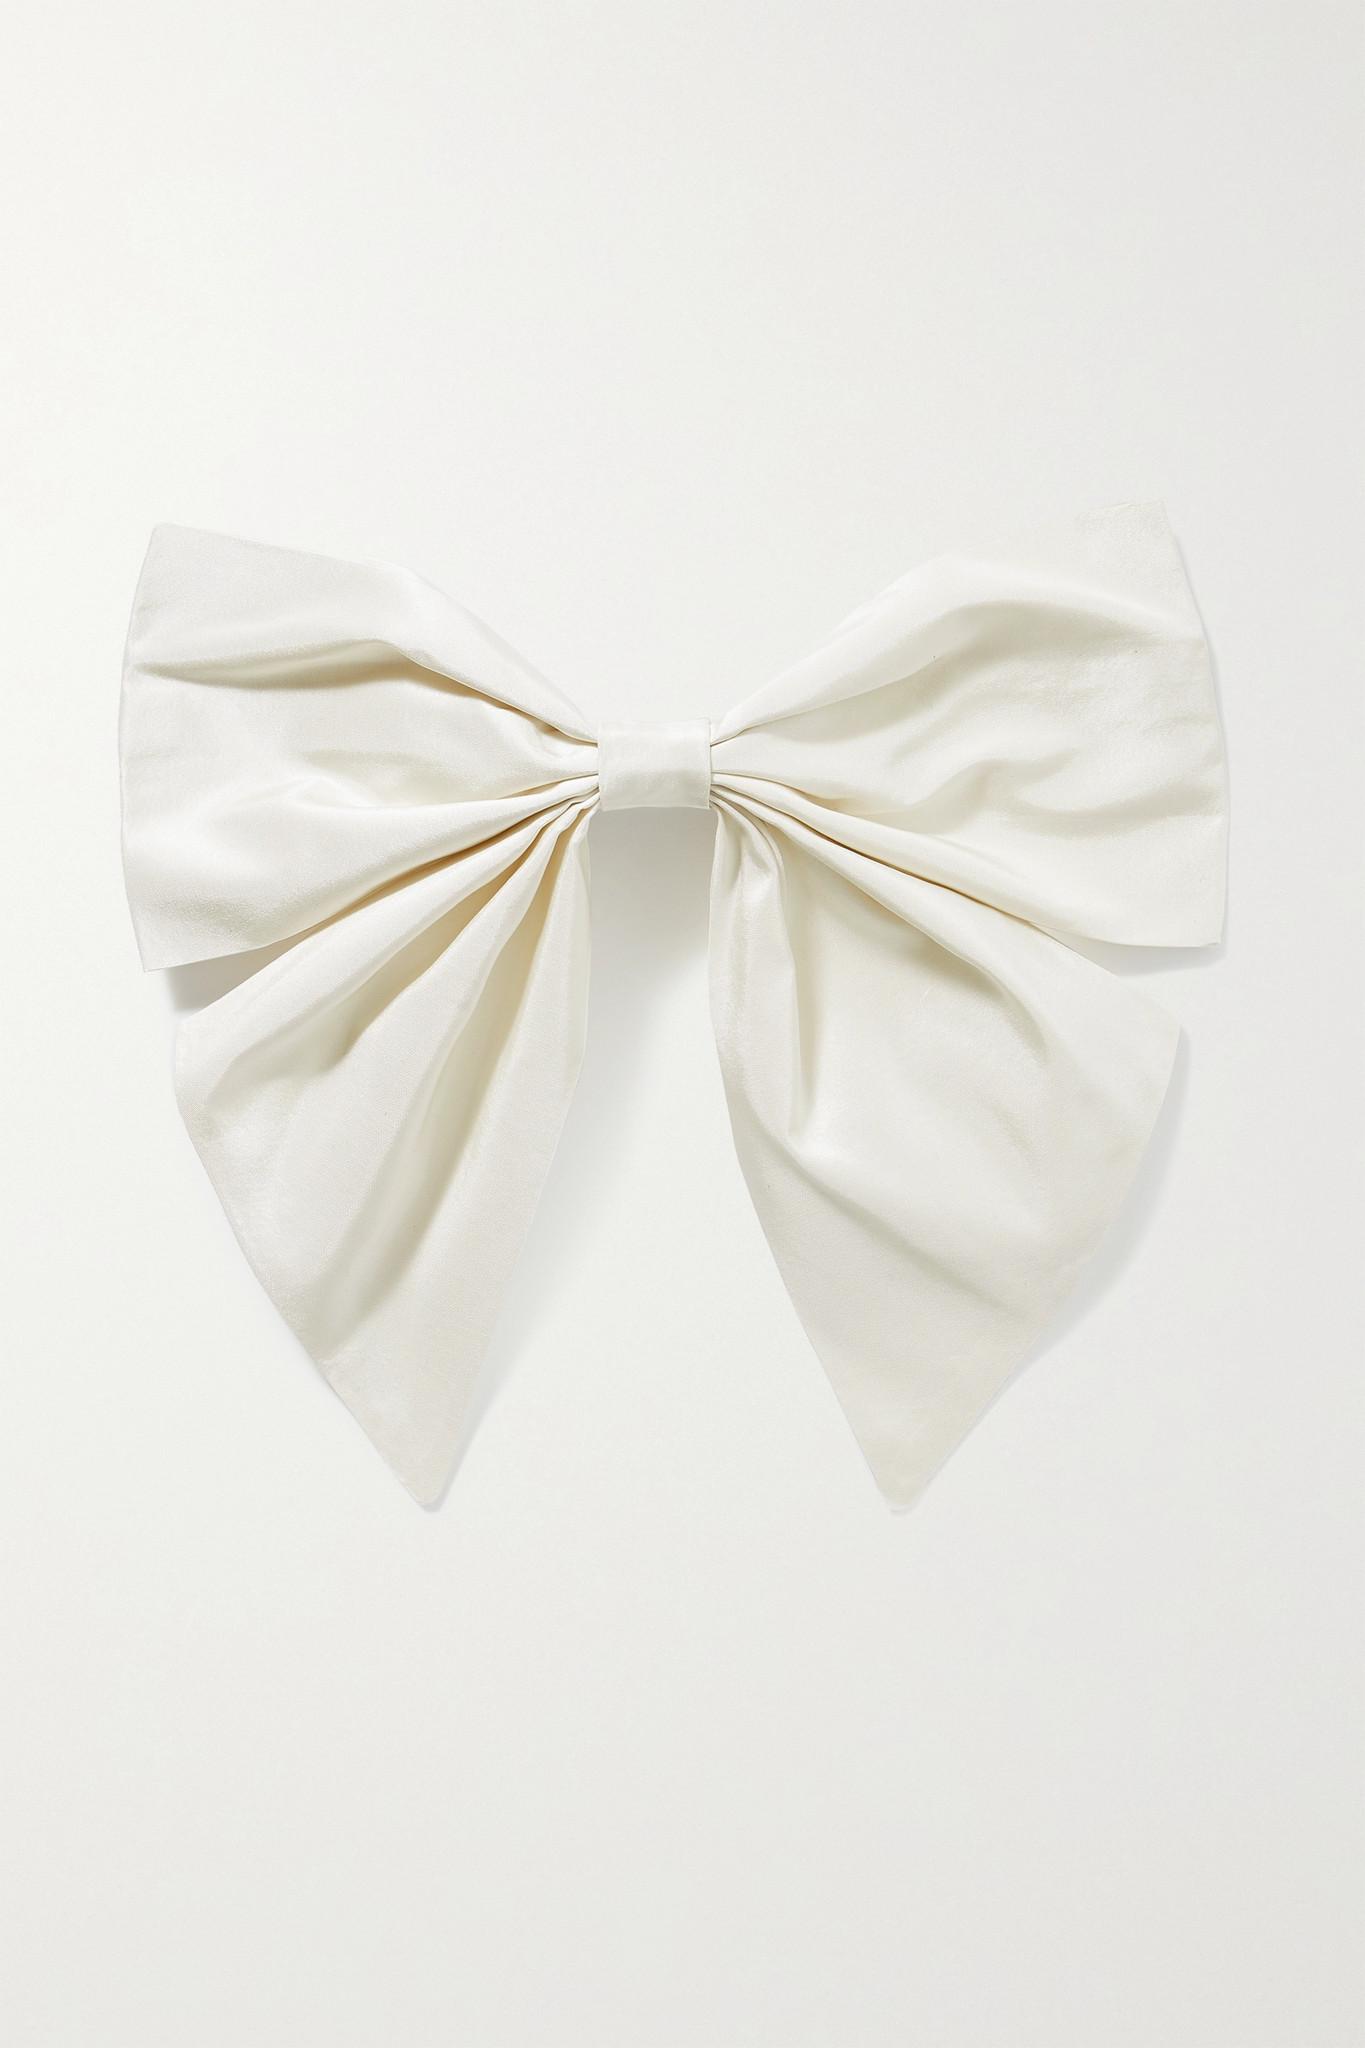 SOPHIE BUHAI - Isabelle 塔夫绸发夹 - 象牙色 - one size